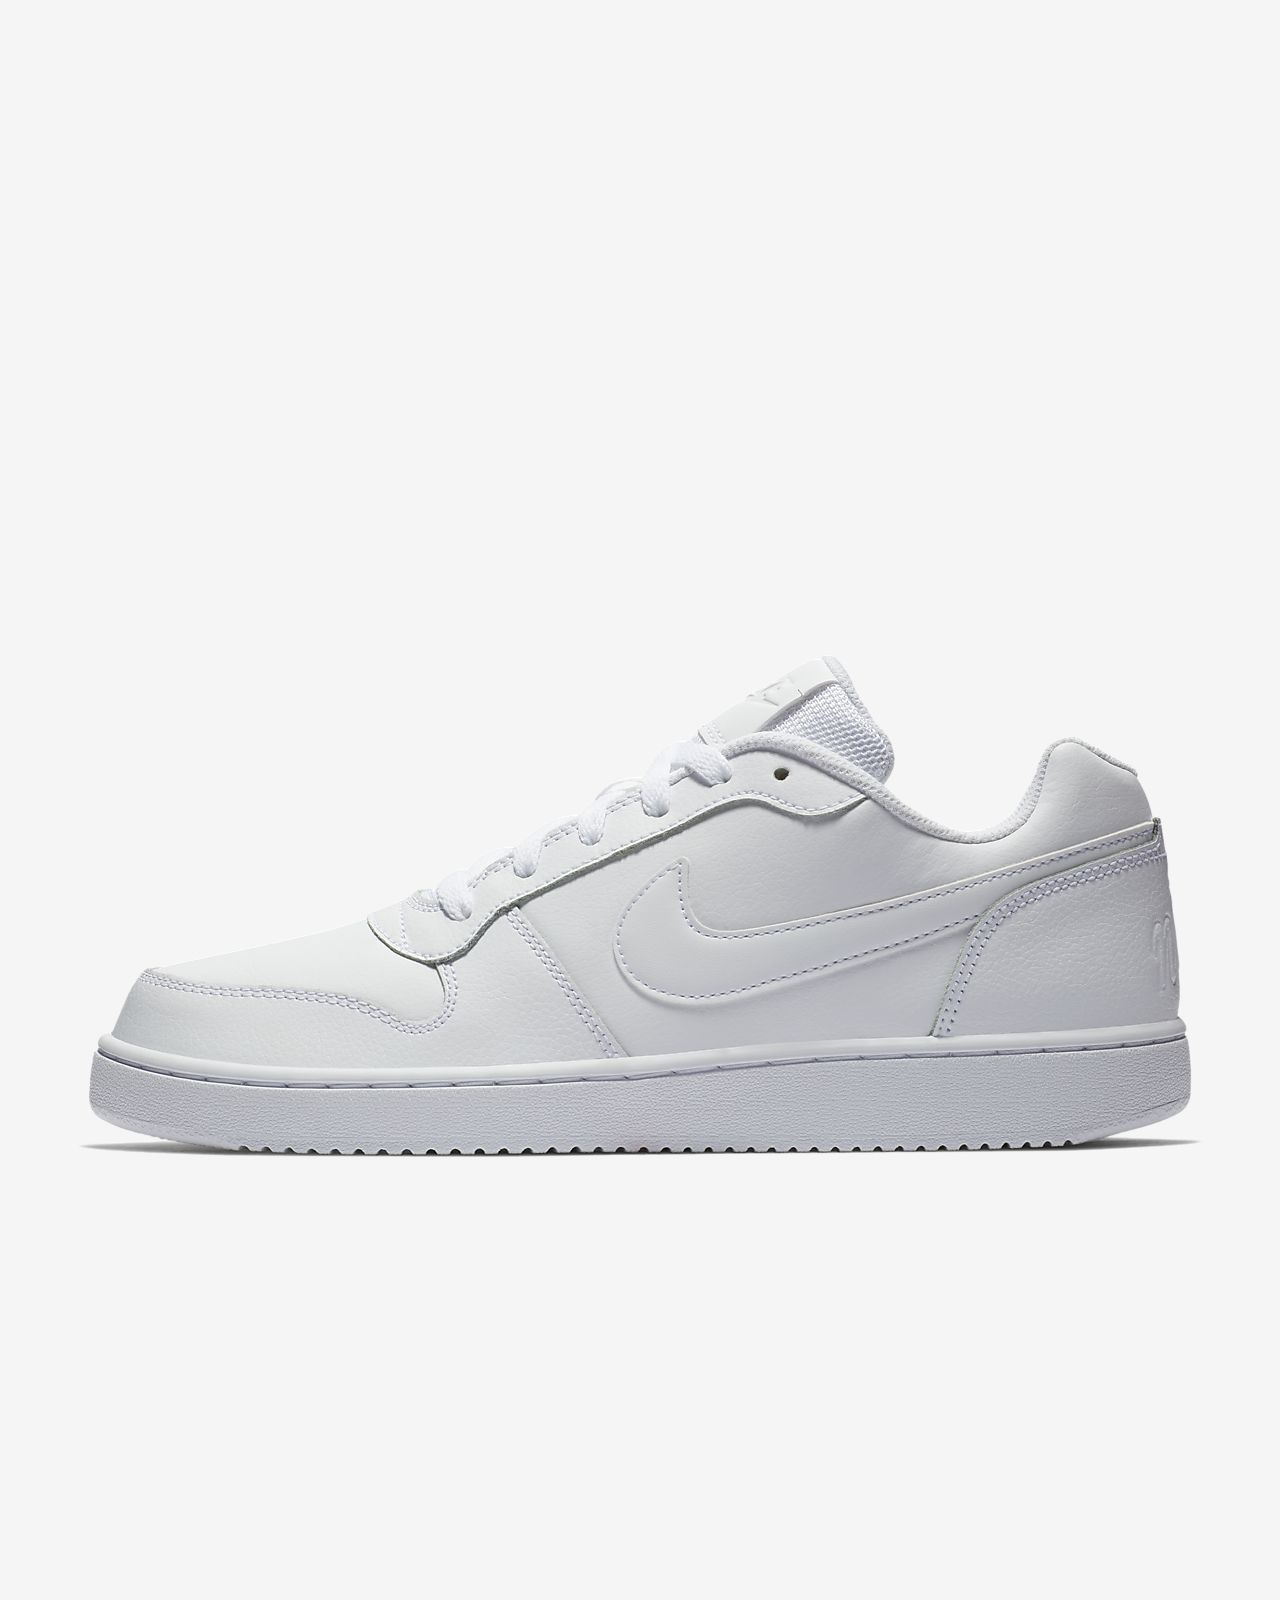 8cb105fa748 Chaussure Nike Ebernon Low pour Homme. Nike.com CA